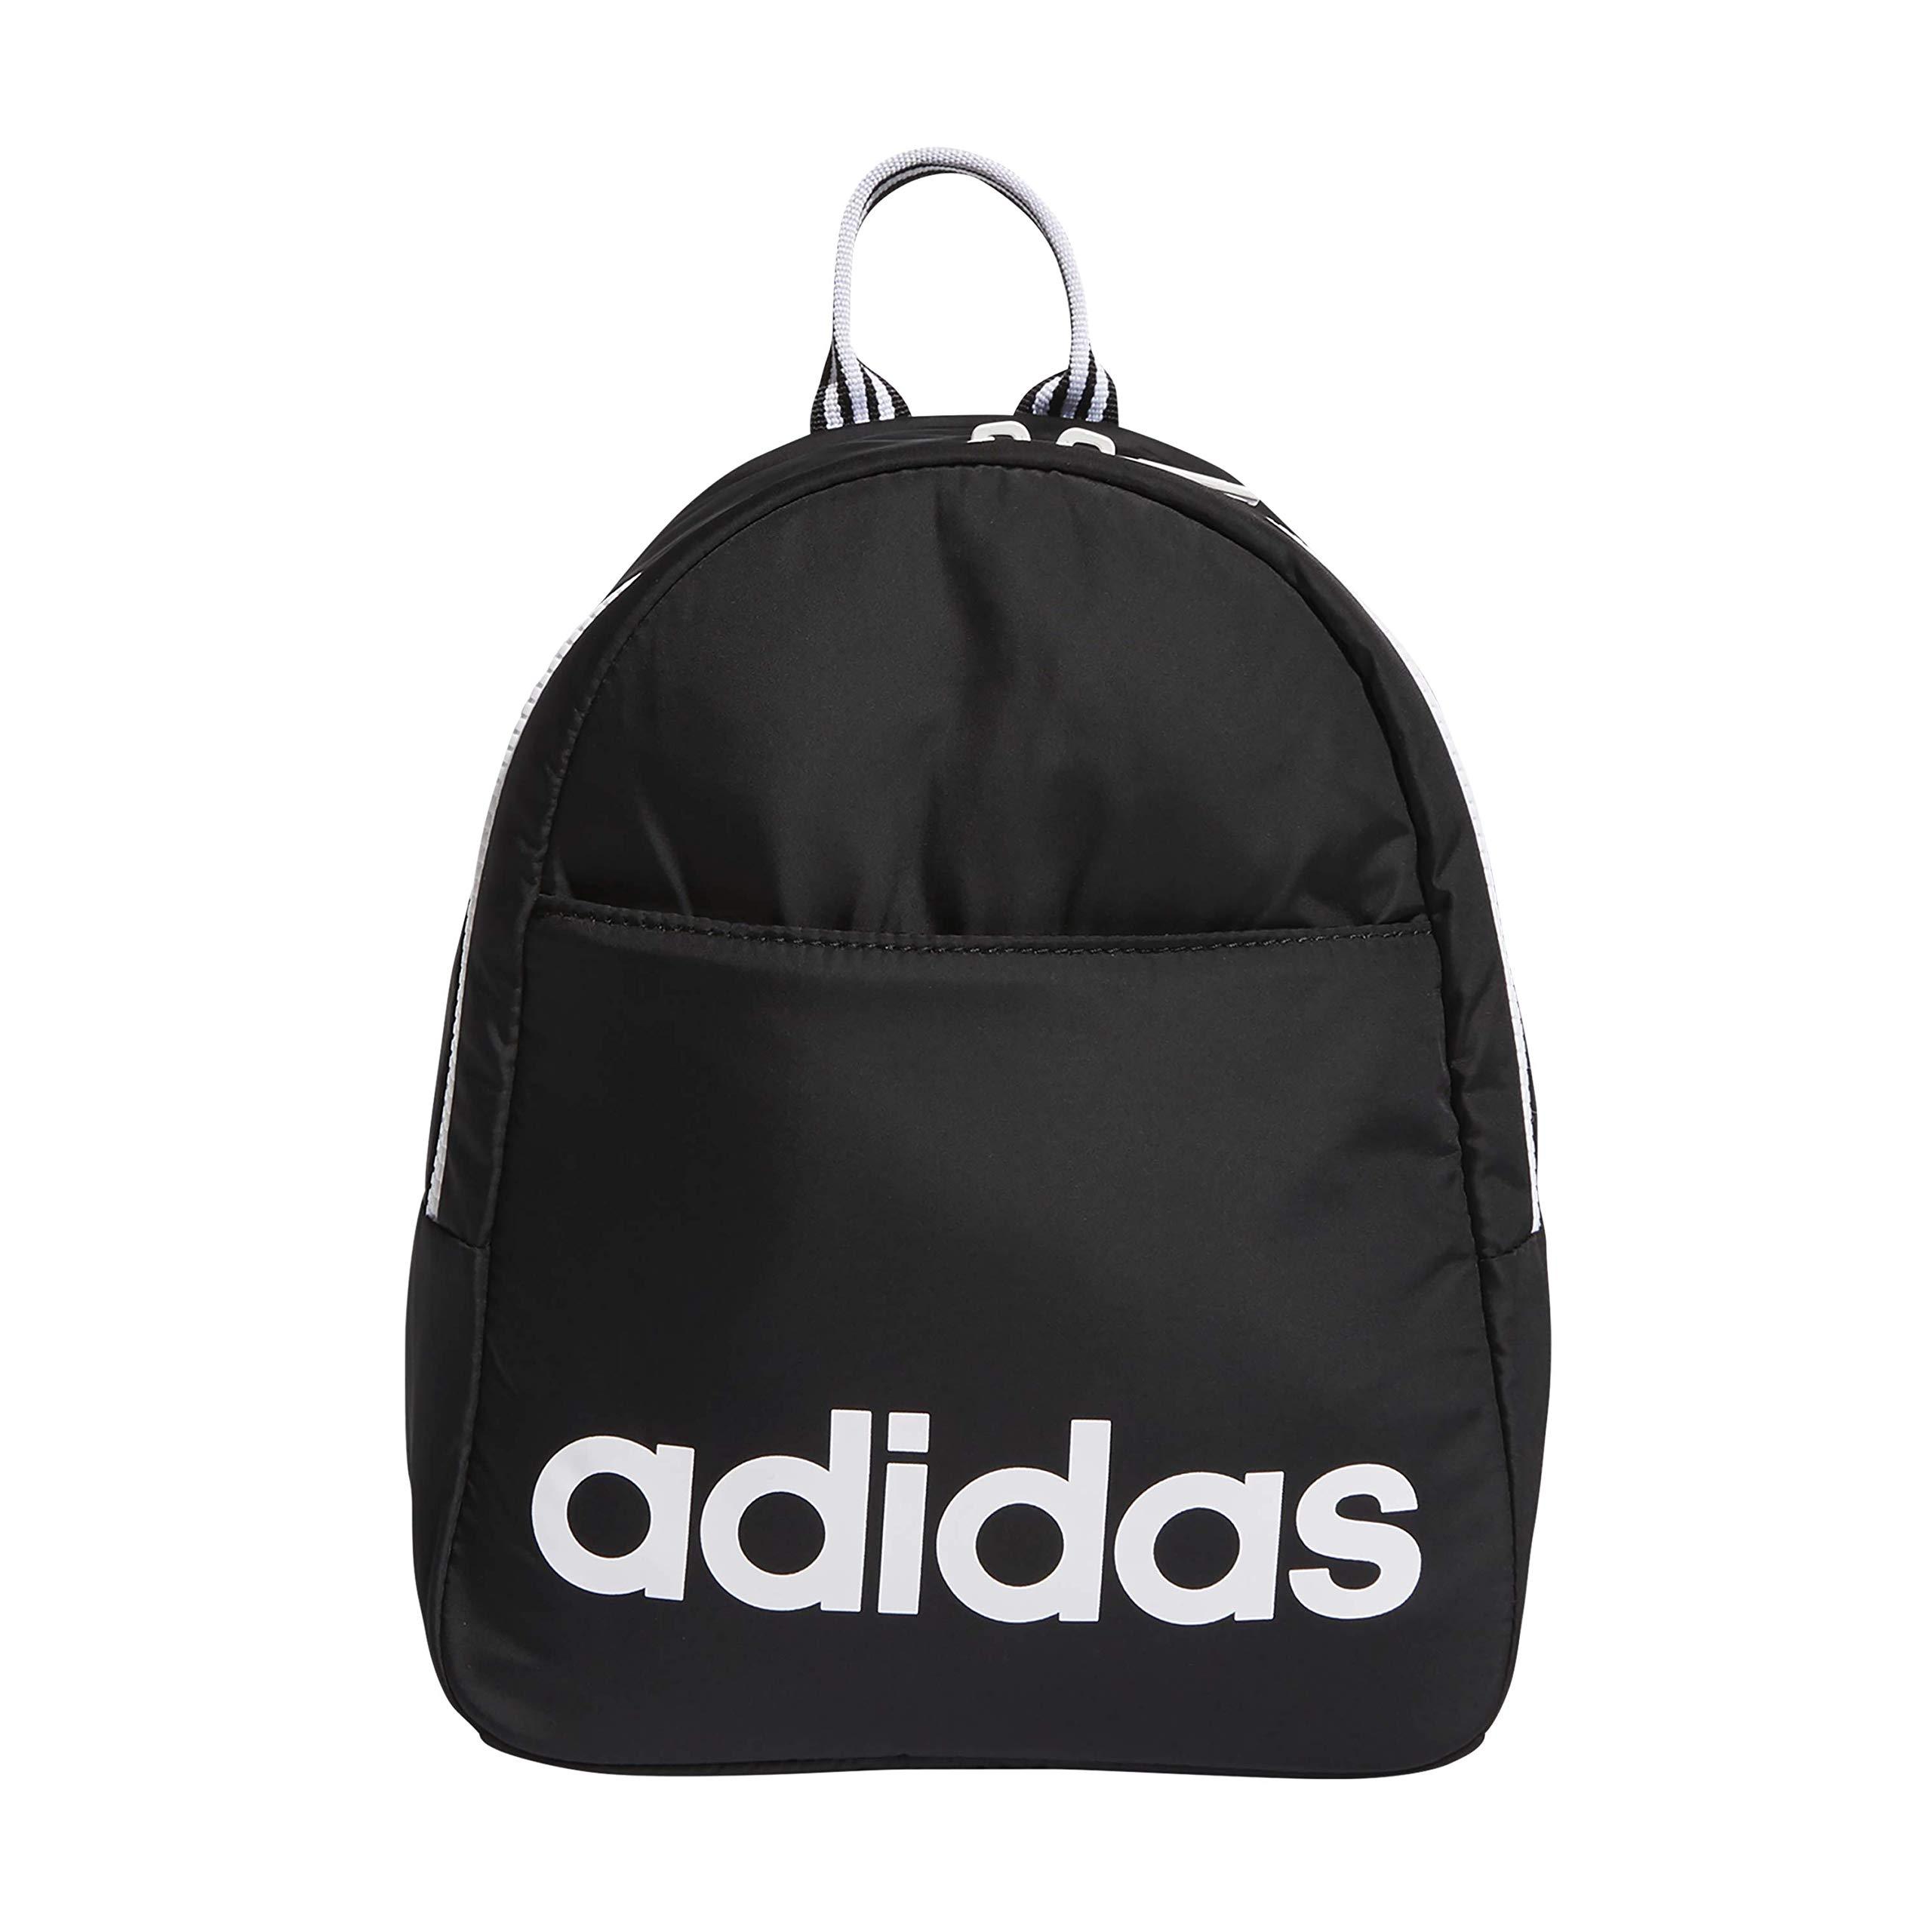 adidas Core Backpack Black White